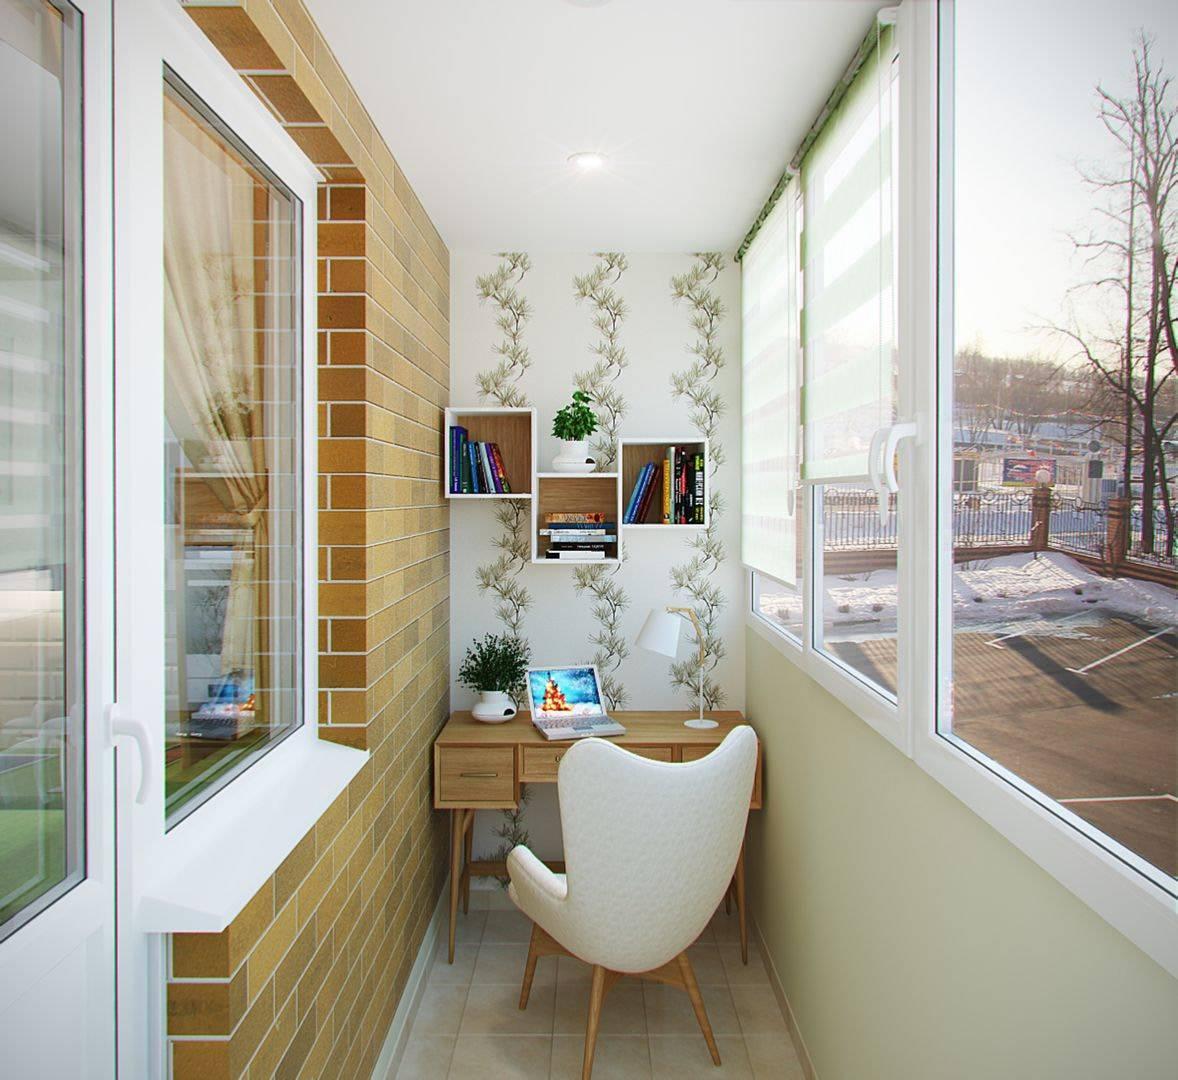 Отделка балкона внутри +100 фото обустройства, материалы обшивки